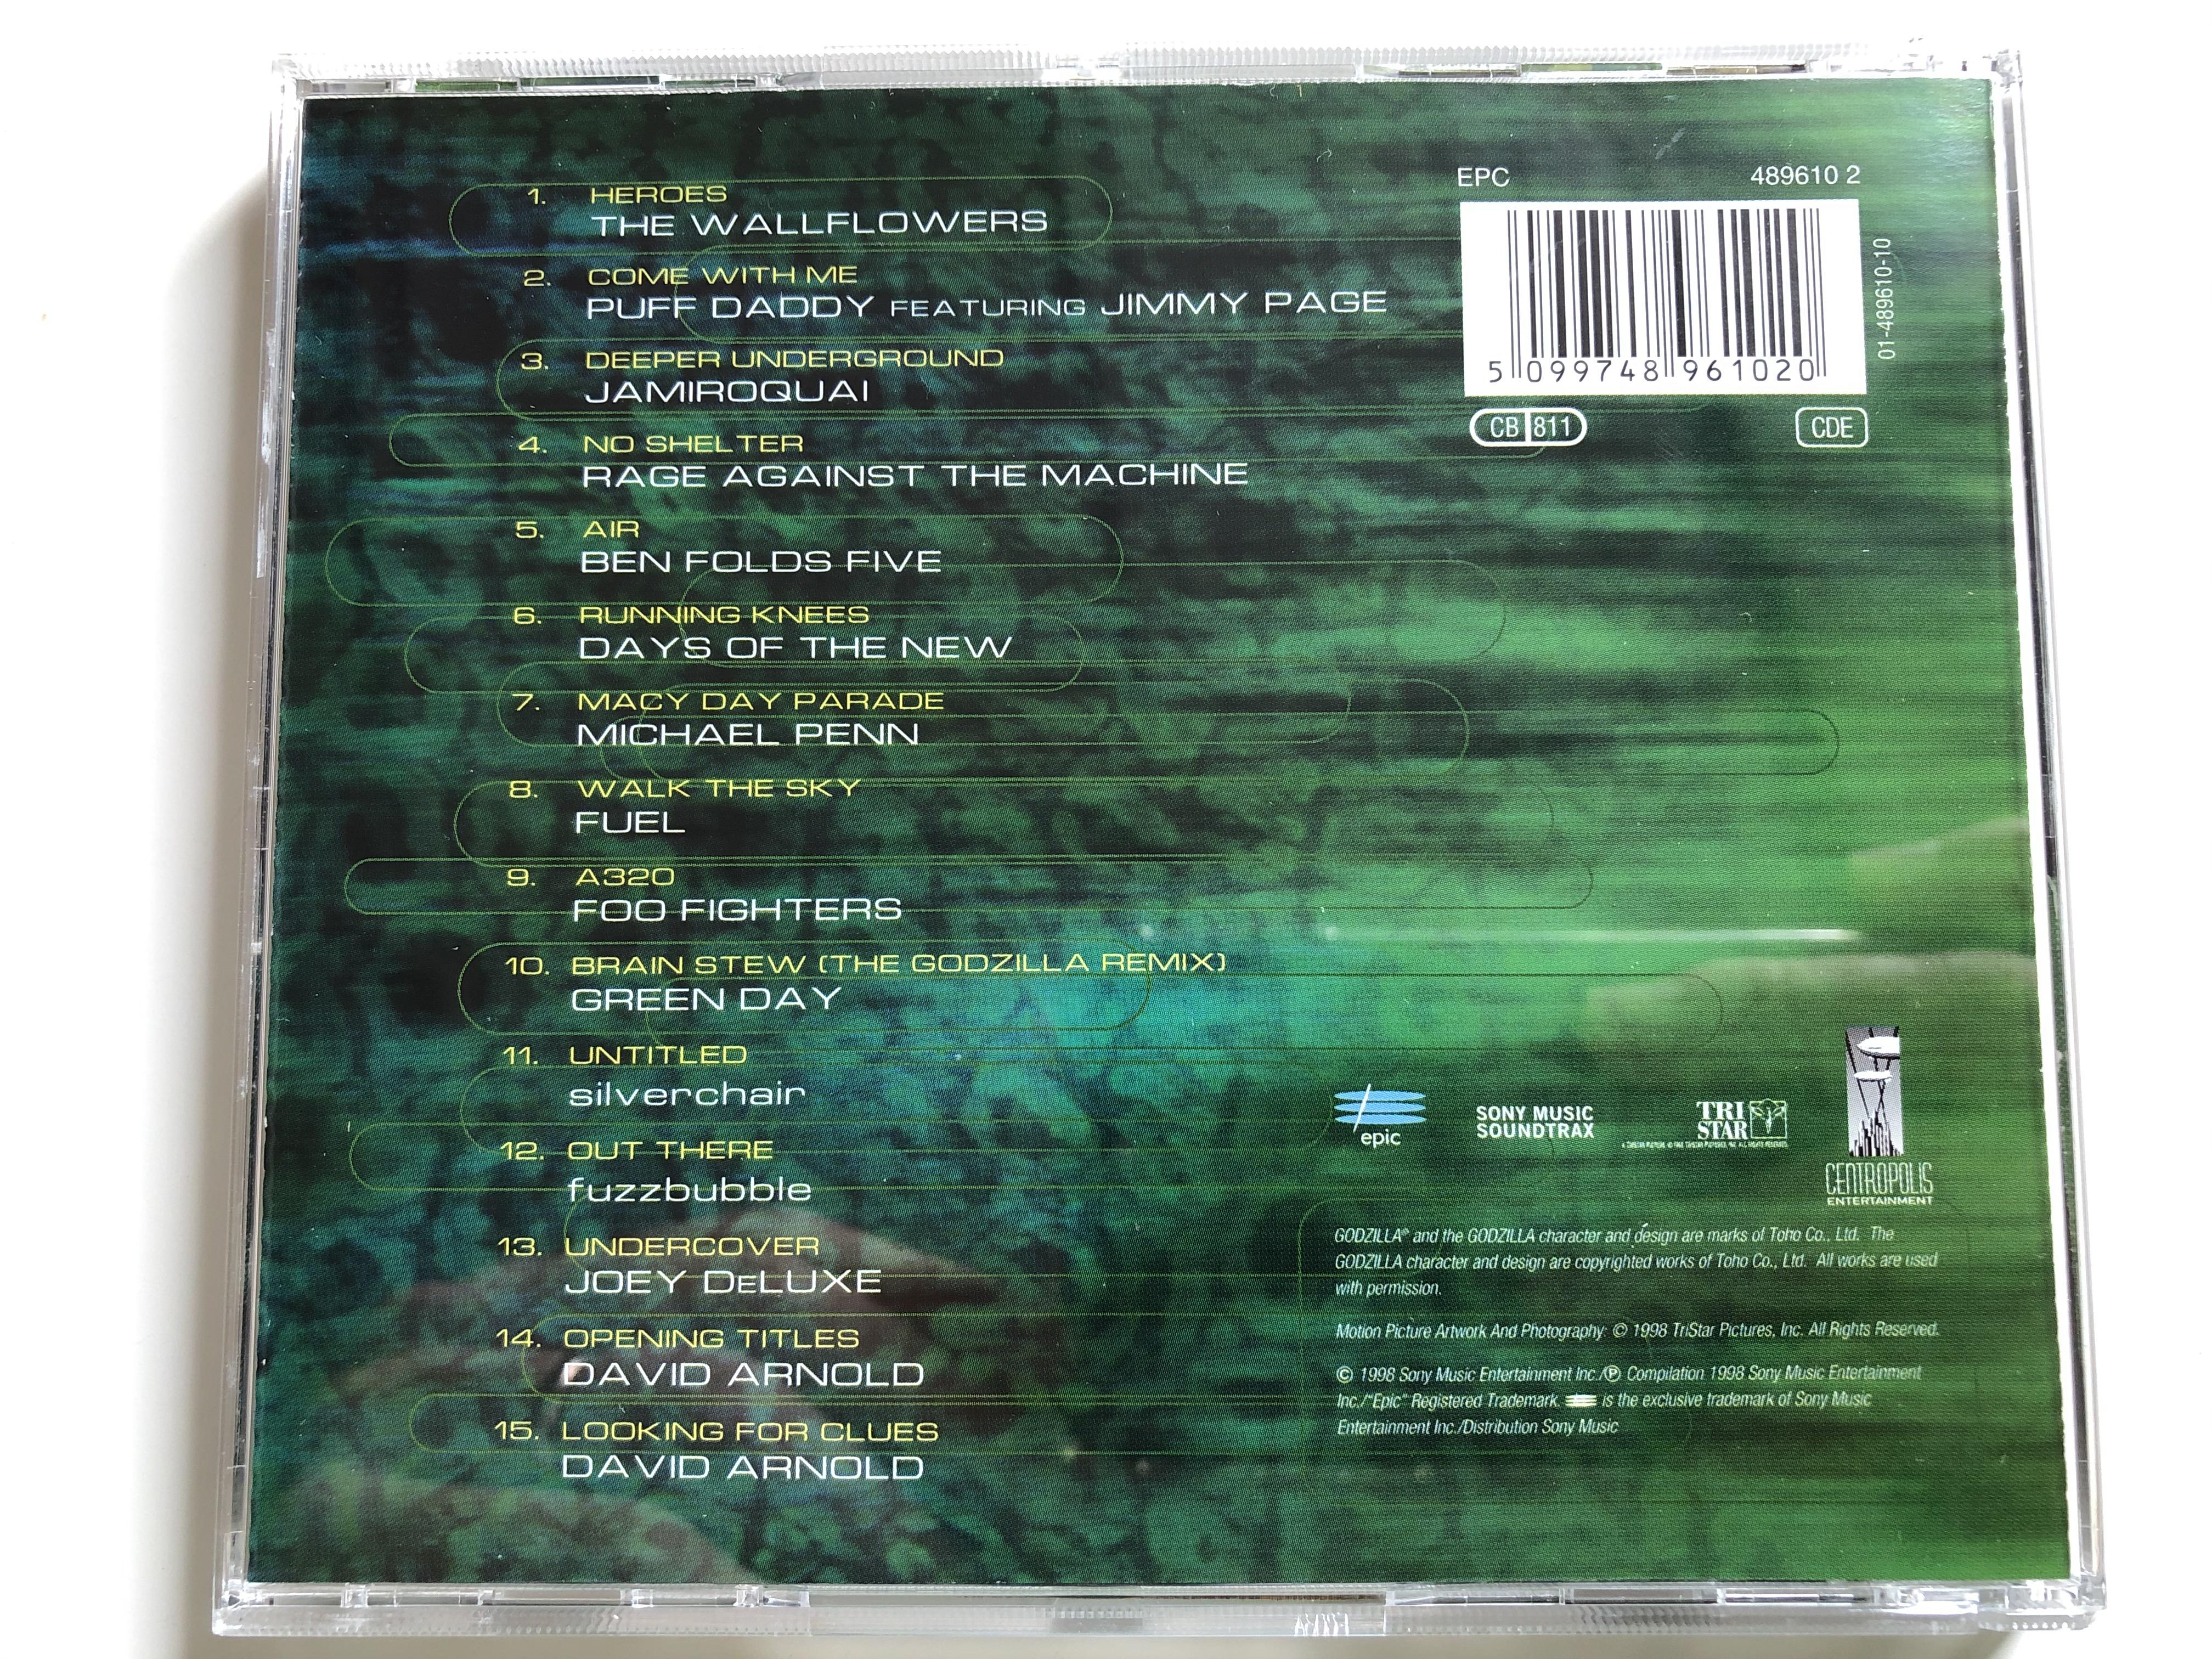 the-album-godzilla-sony-music-soundtrax-audio-cd-1998-489610-2-9-.jpg